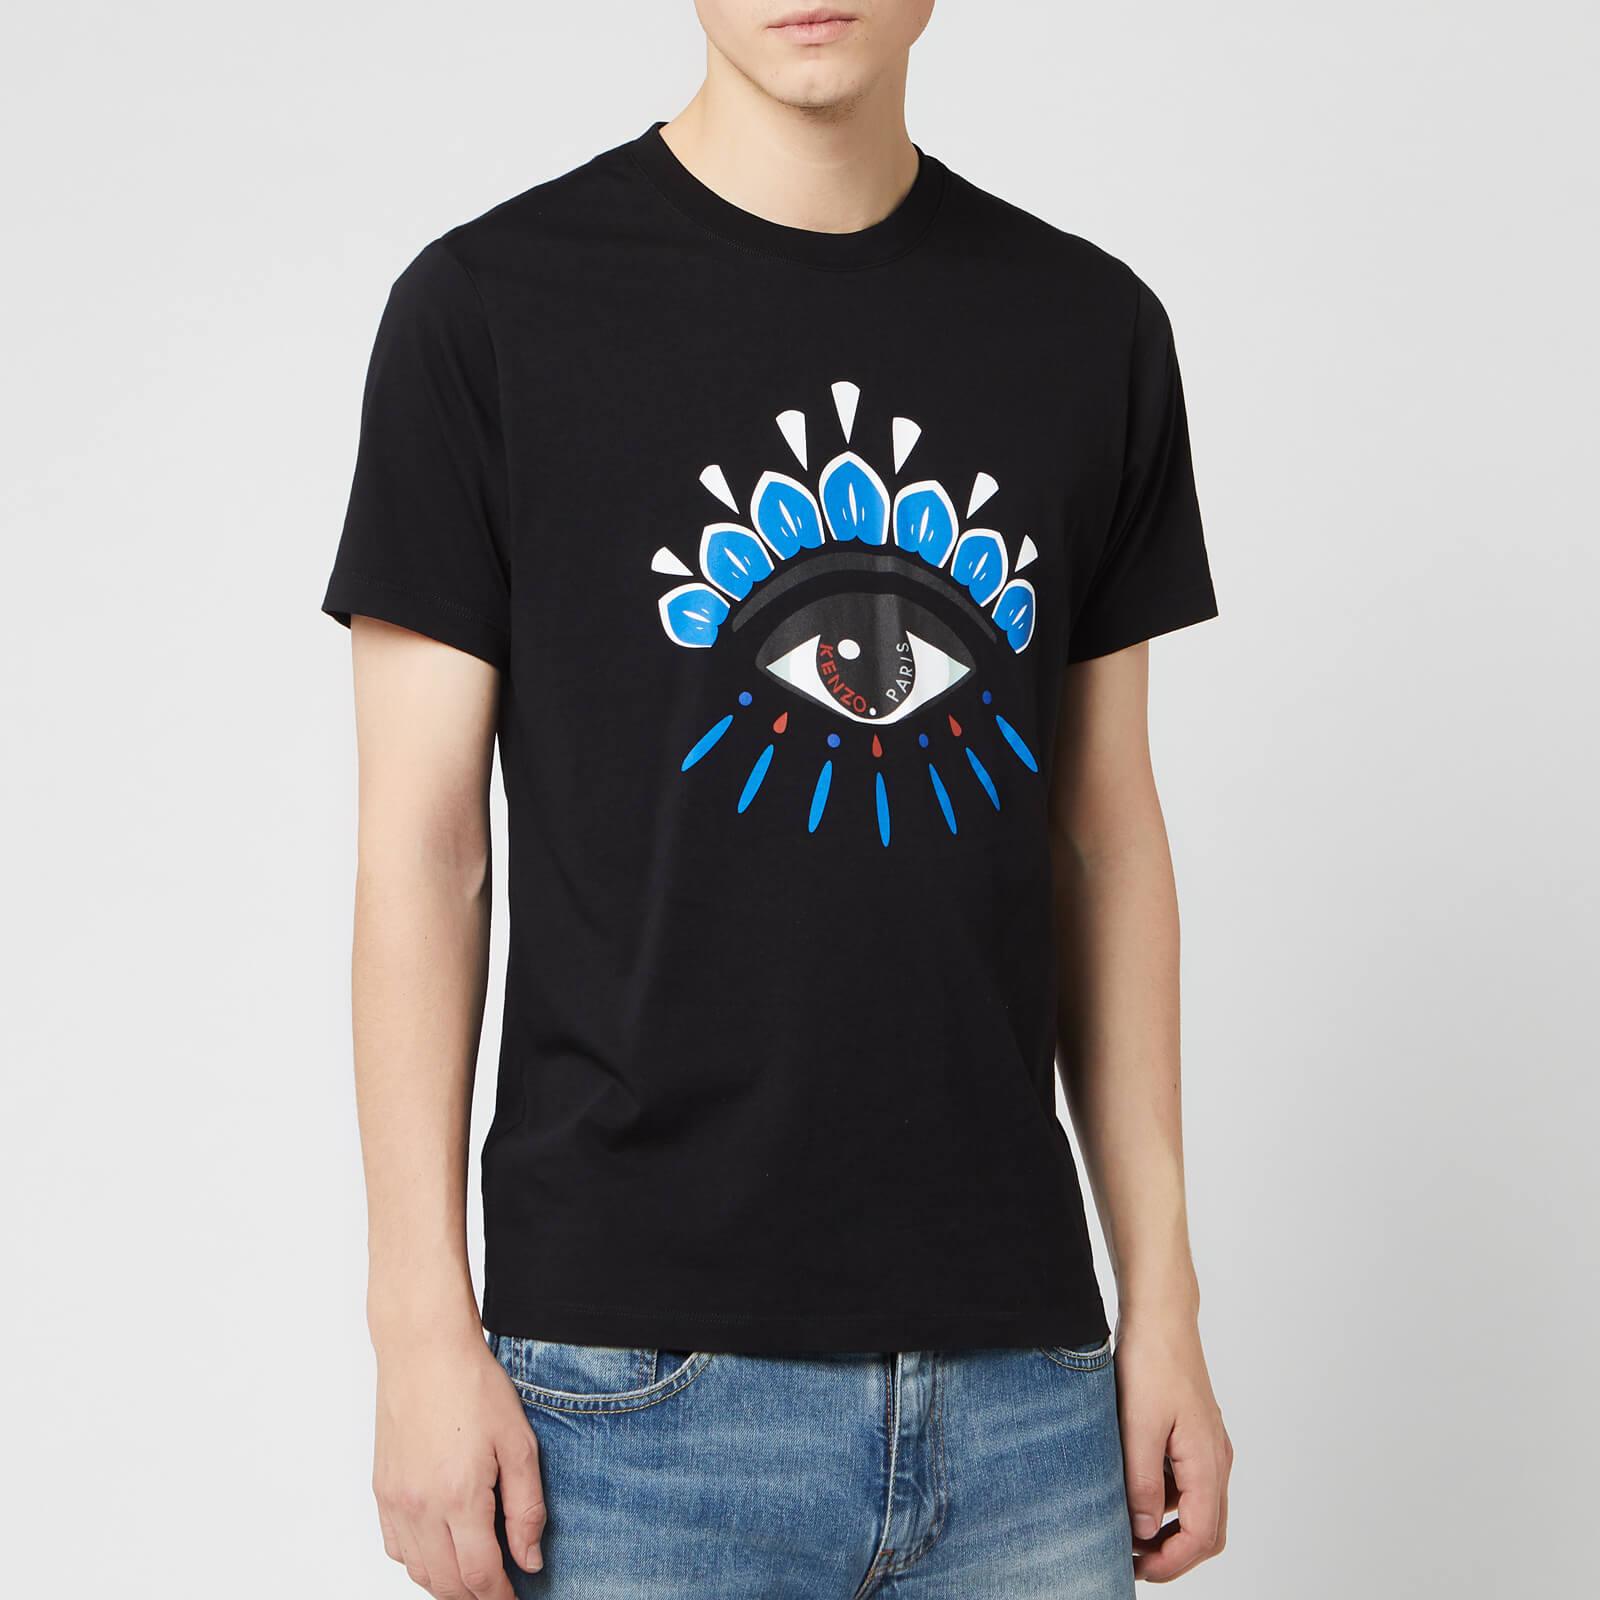 e54bcf3c3d KENZO Men's Classic Eye T-Shirt - Black